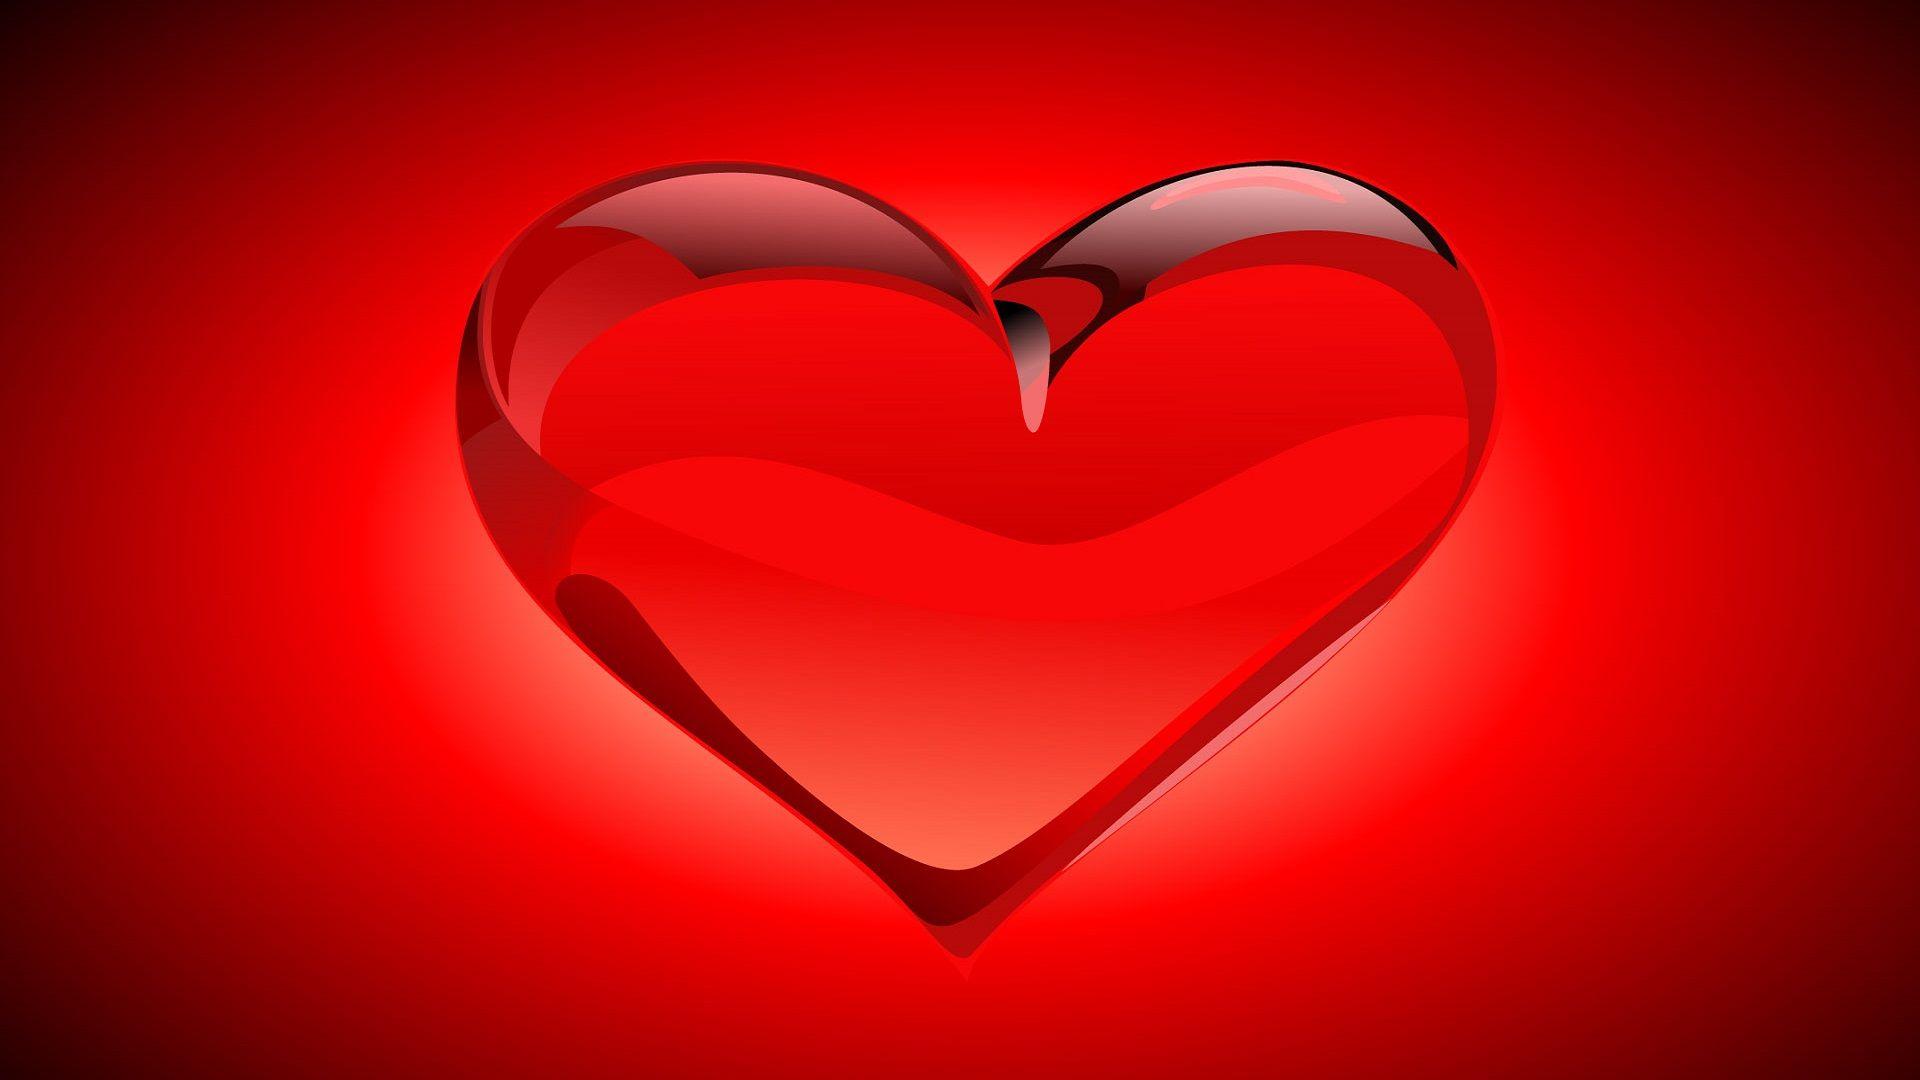 Heart wallpaper download